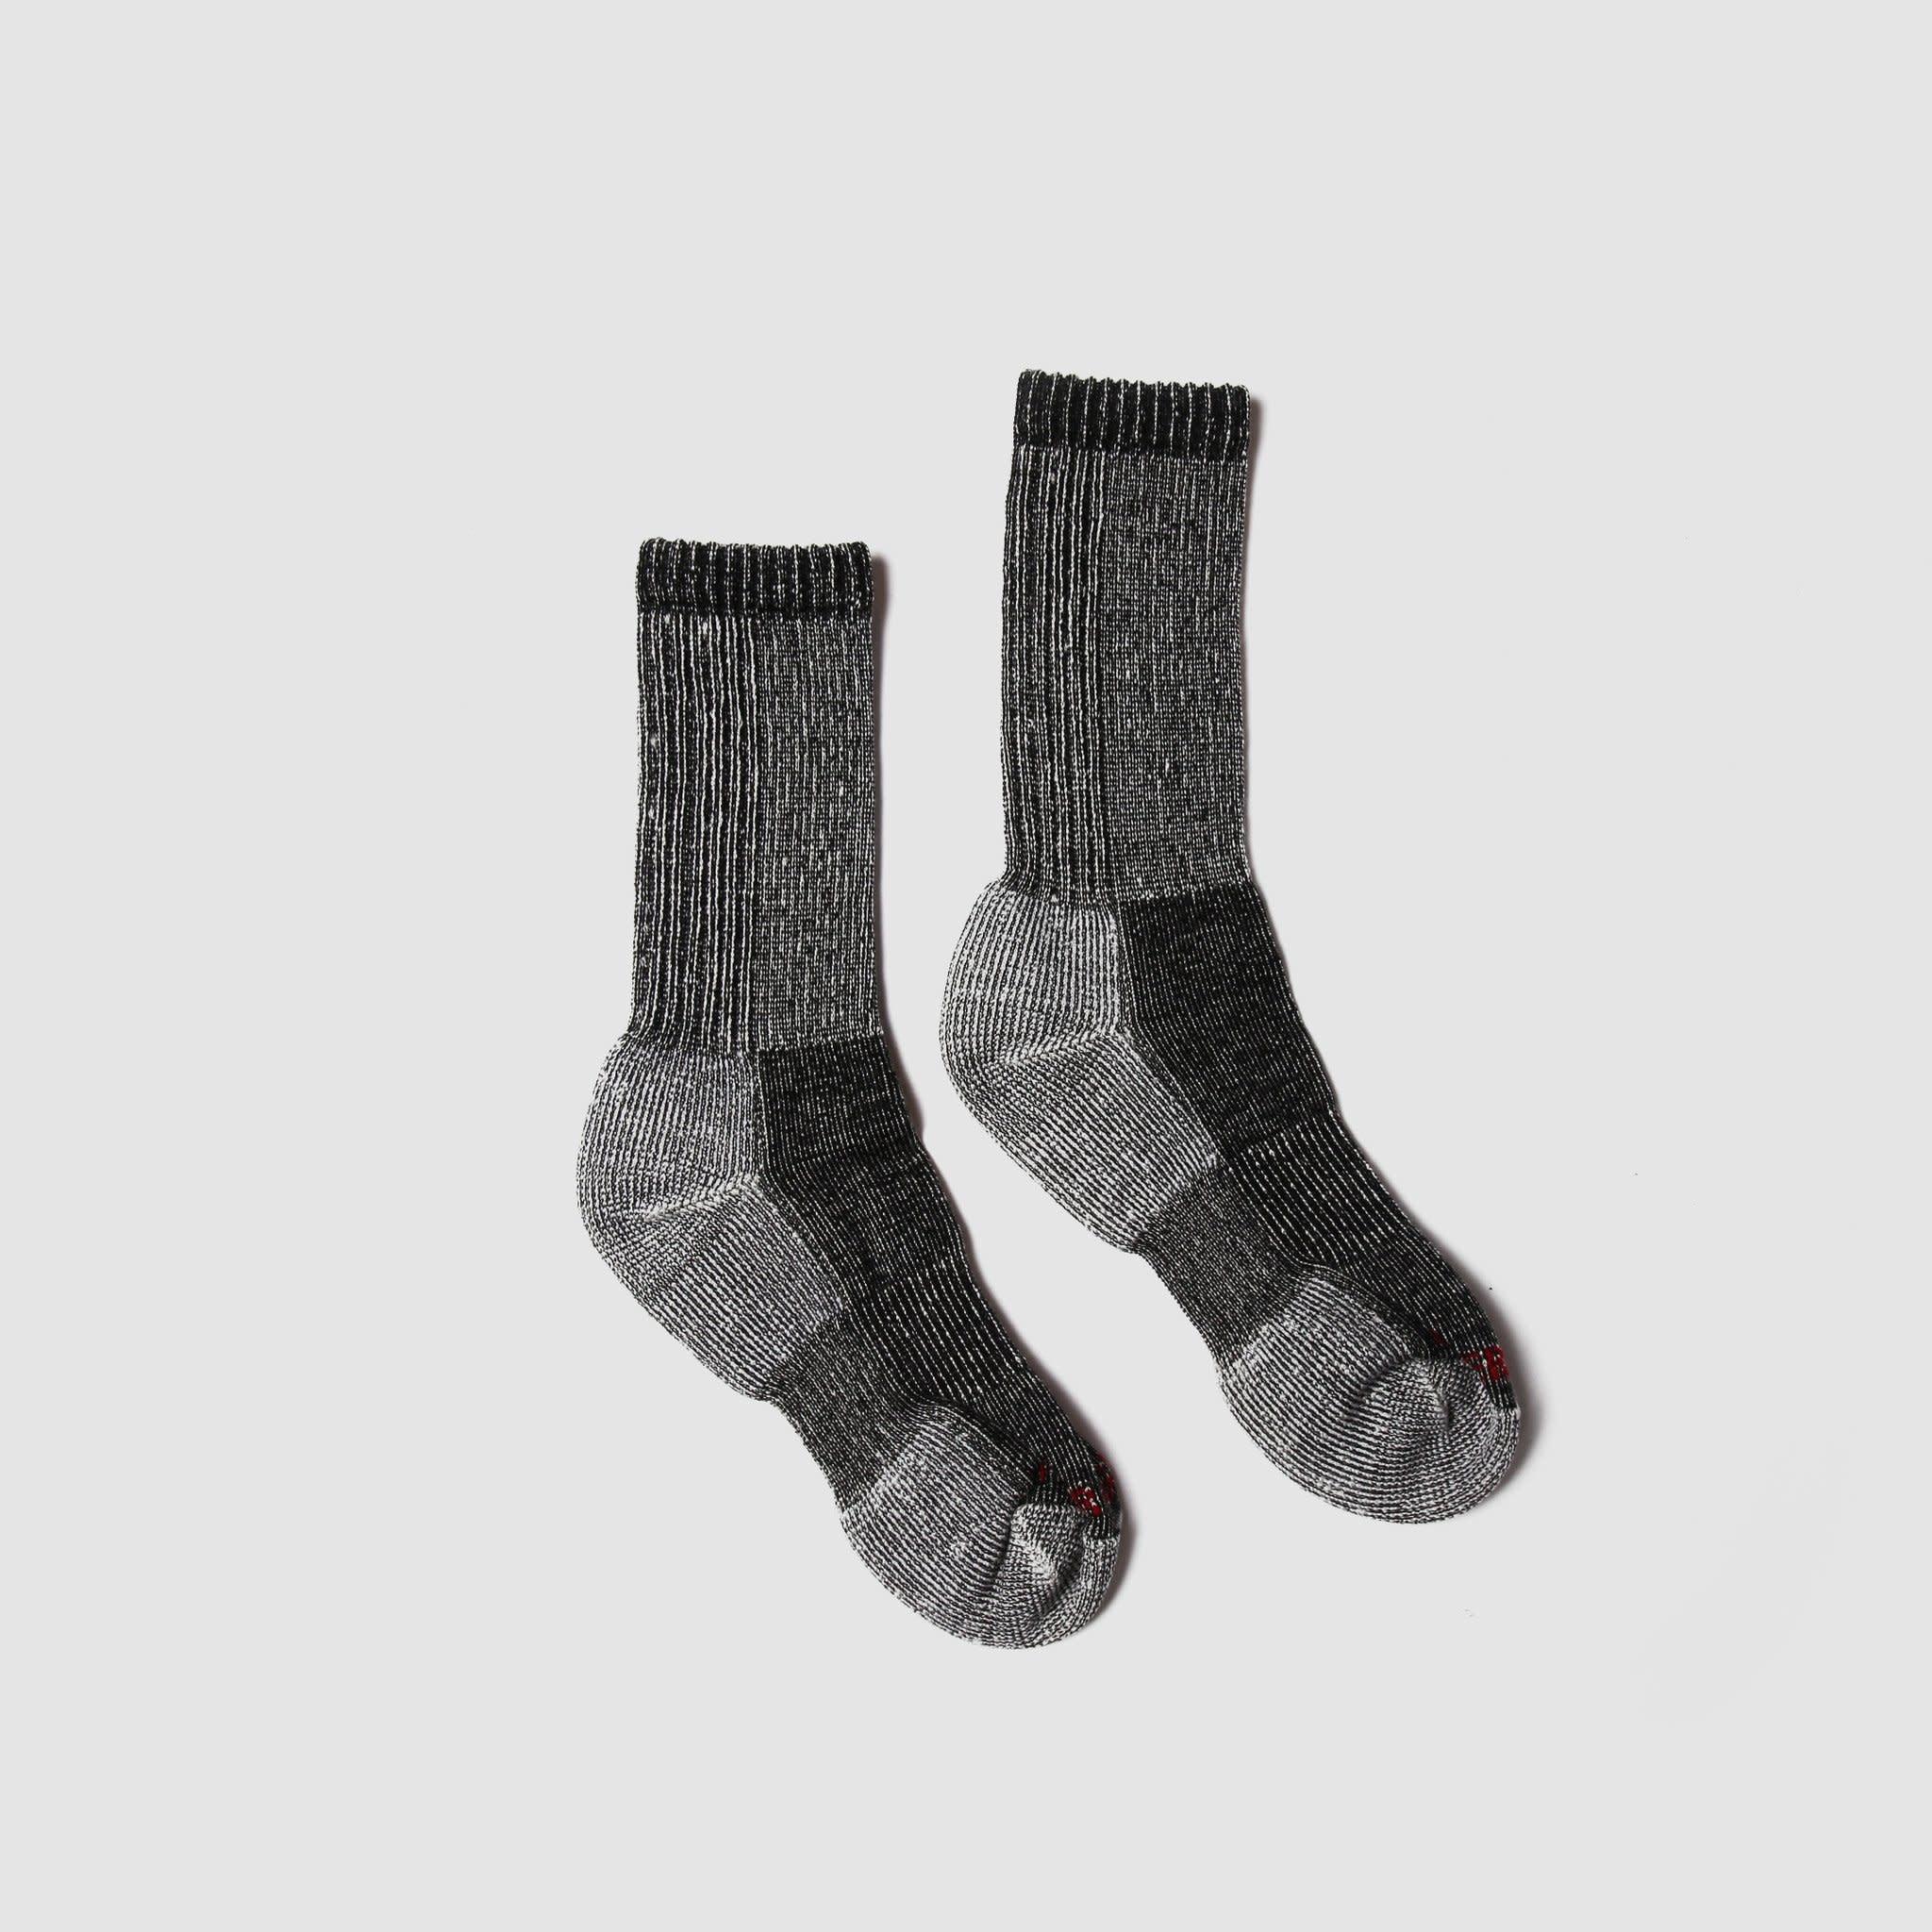 Muttonhead Merino Hiking Socks